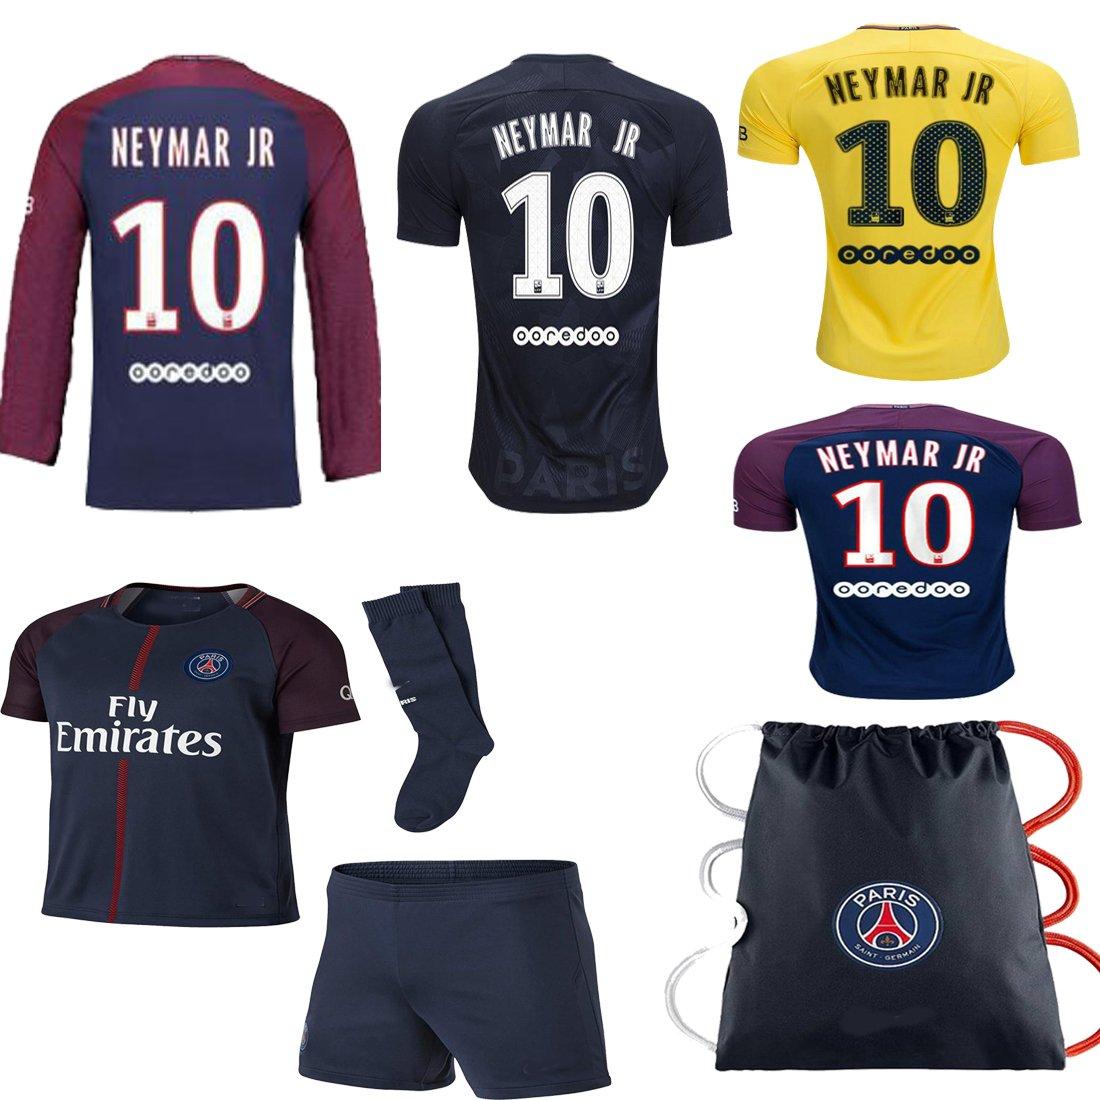 b49aeaadf Vivishop PSG Neymar Kid Youth 2017 18 17 2018 PSG Neymar Paris Saint  Germaine Replica Home